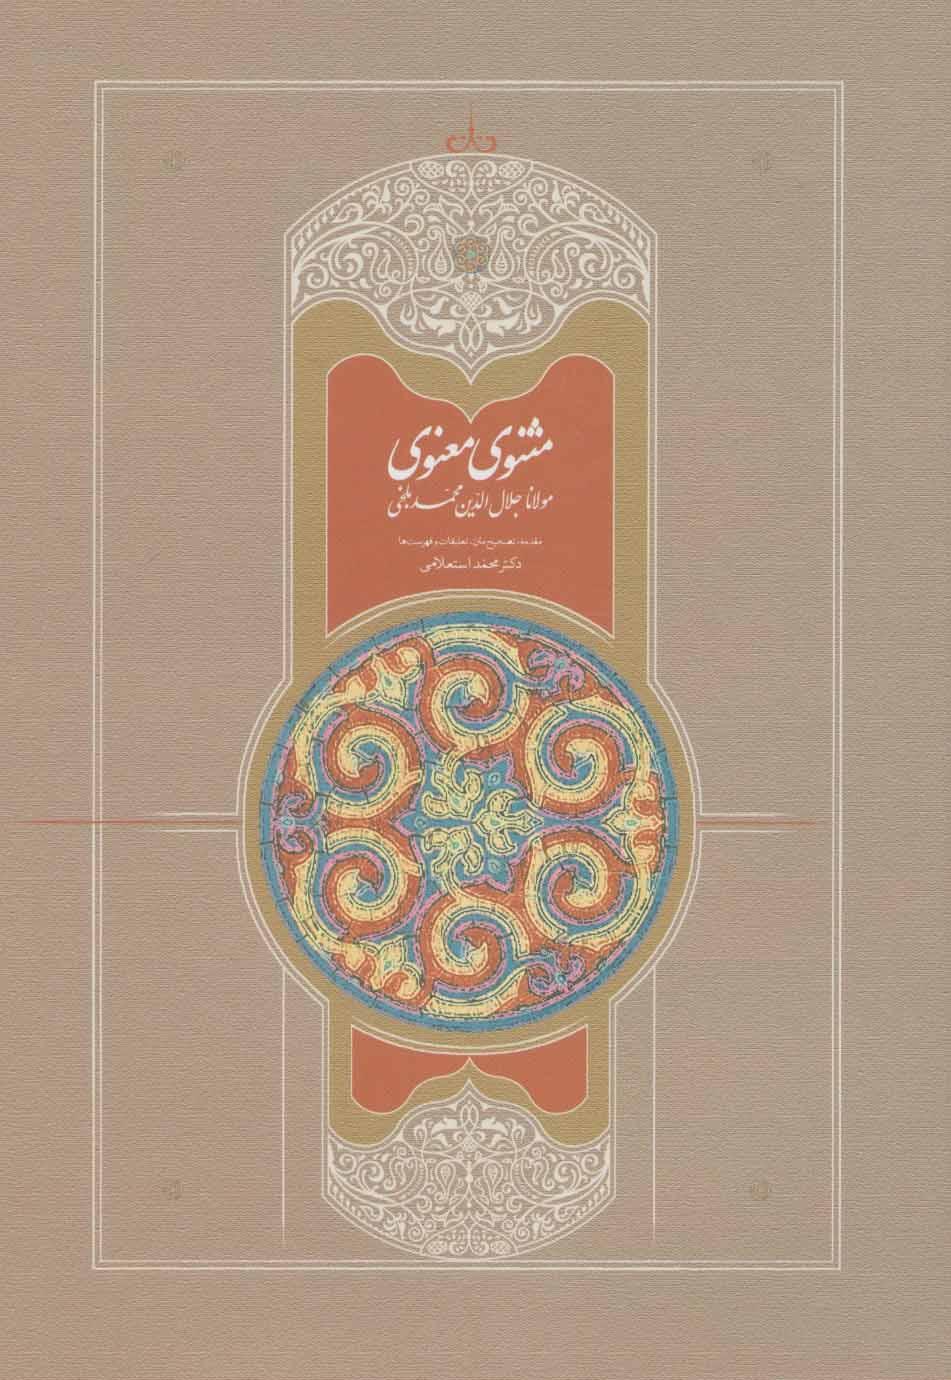 مثنوی استعلامی (7جلدی)